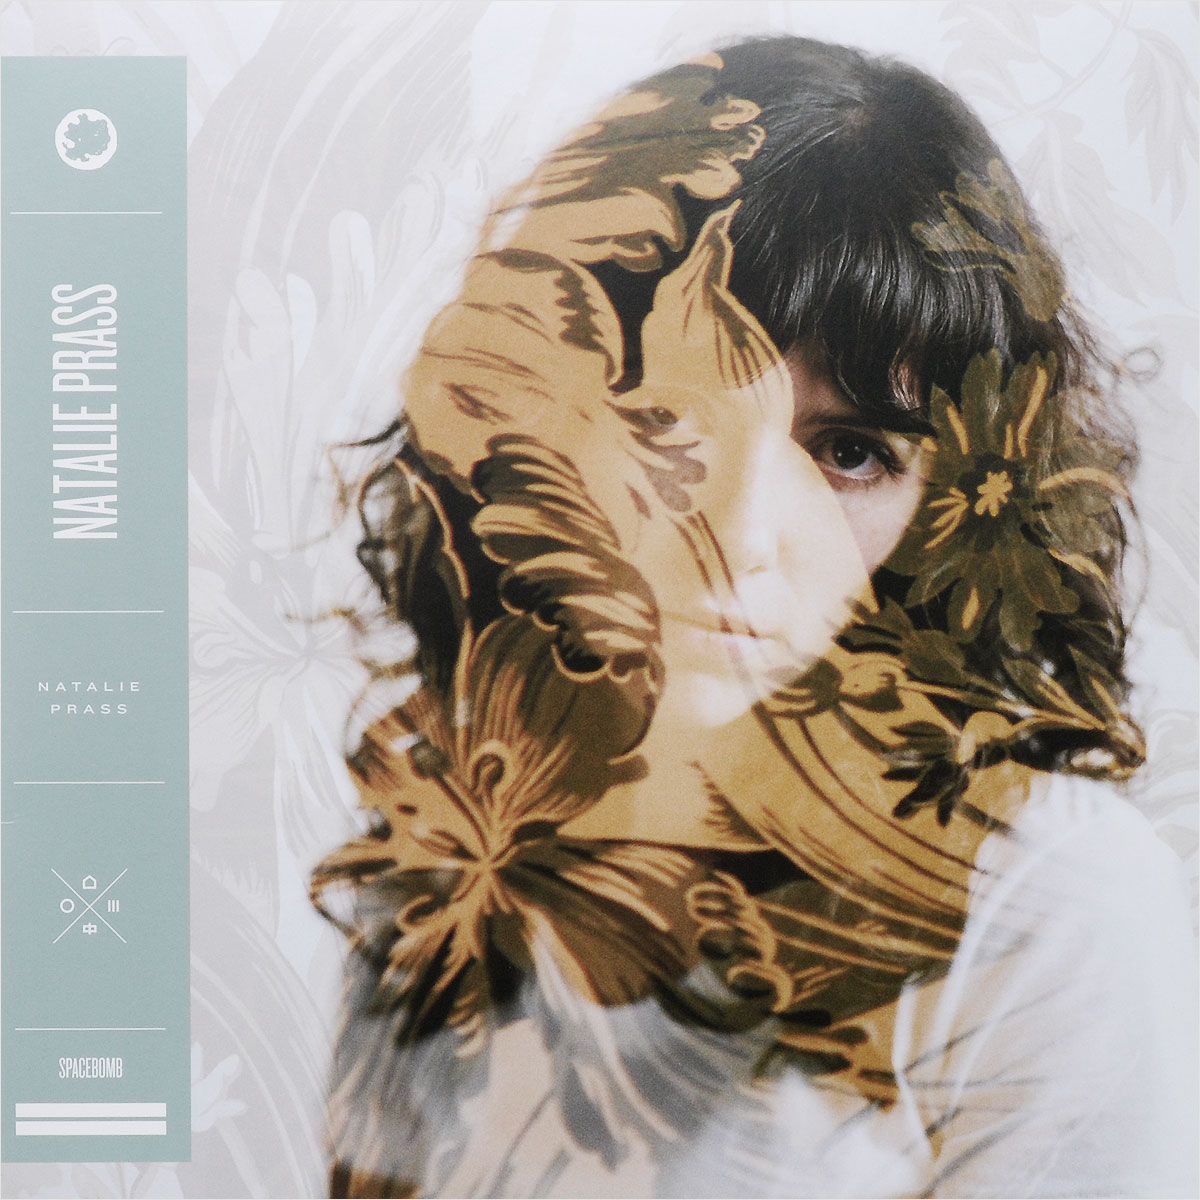 LP 1:Tracks 1 - 4LP 2:Tracks 5 - 9